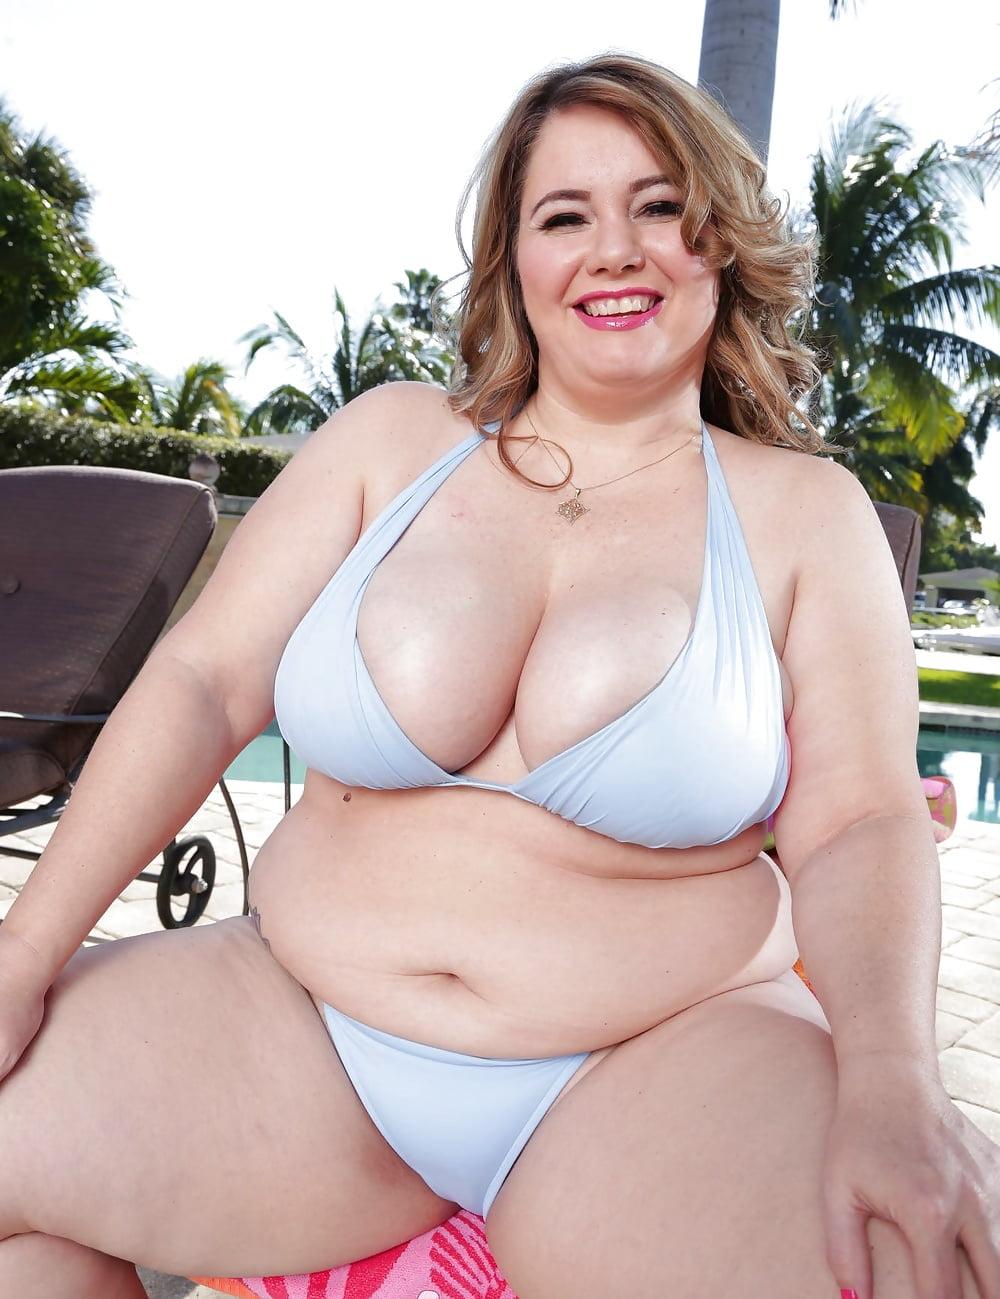 Pussy live fat girl sex pics bouff threesome